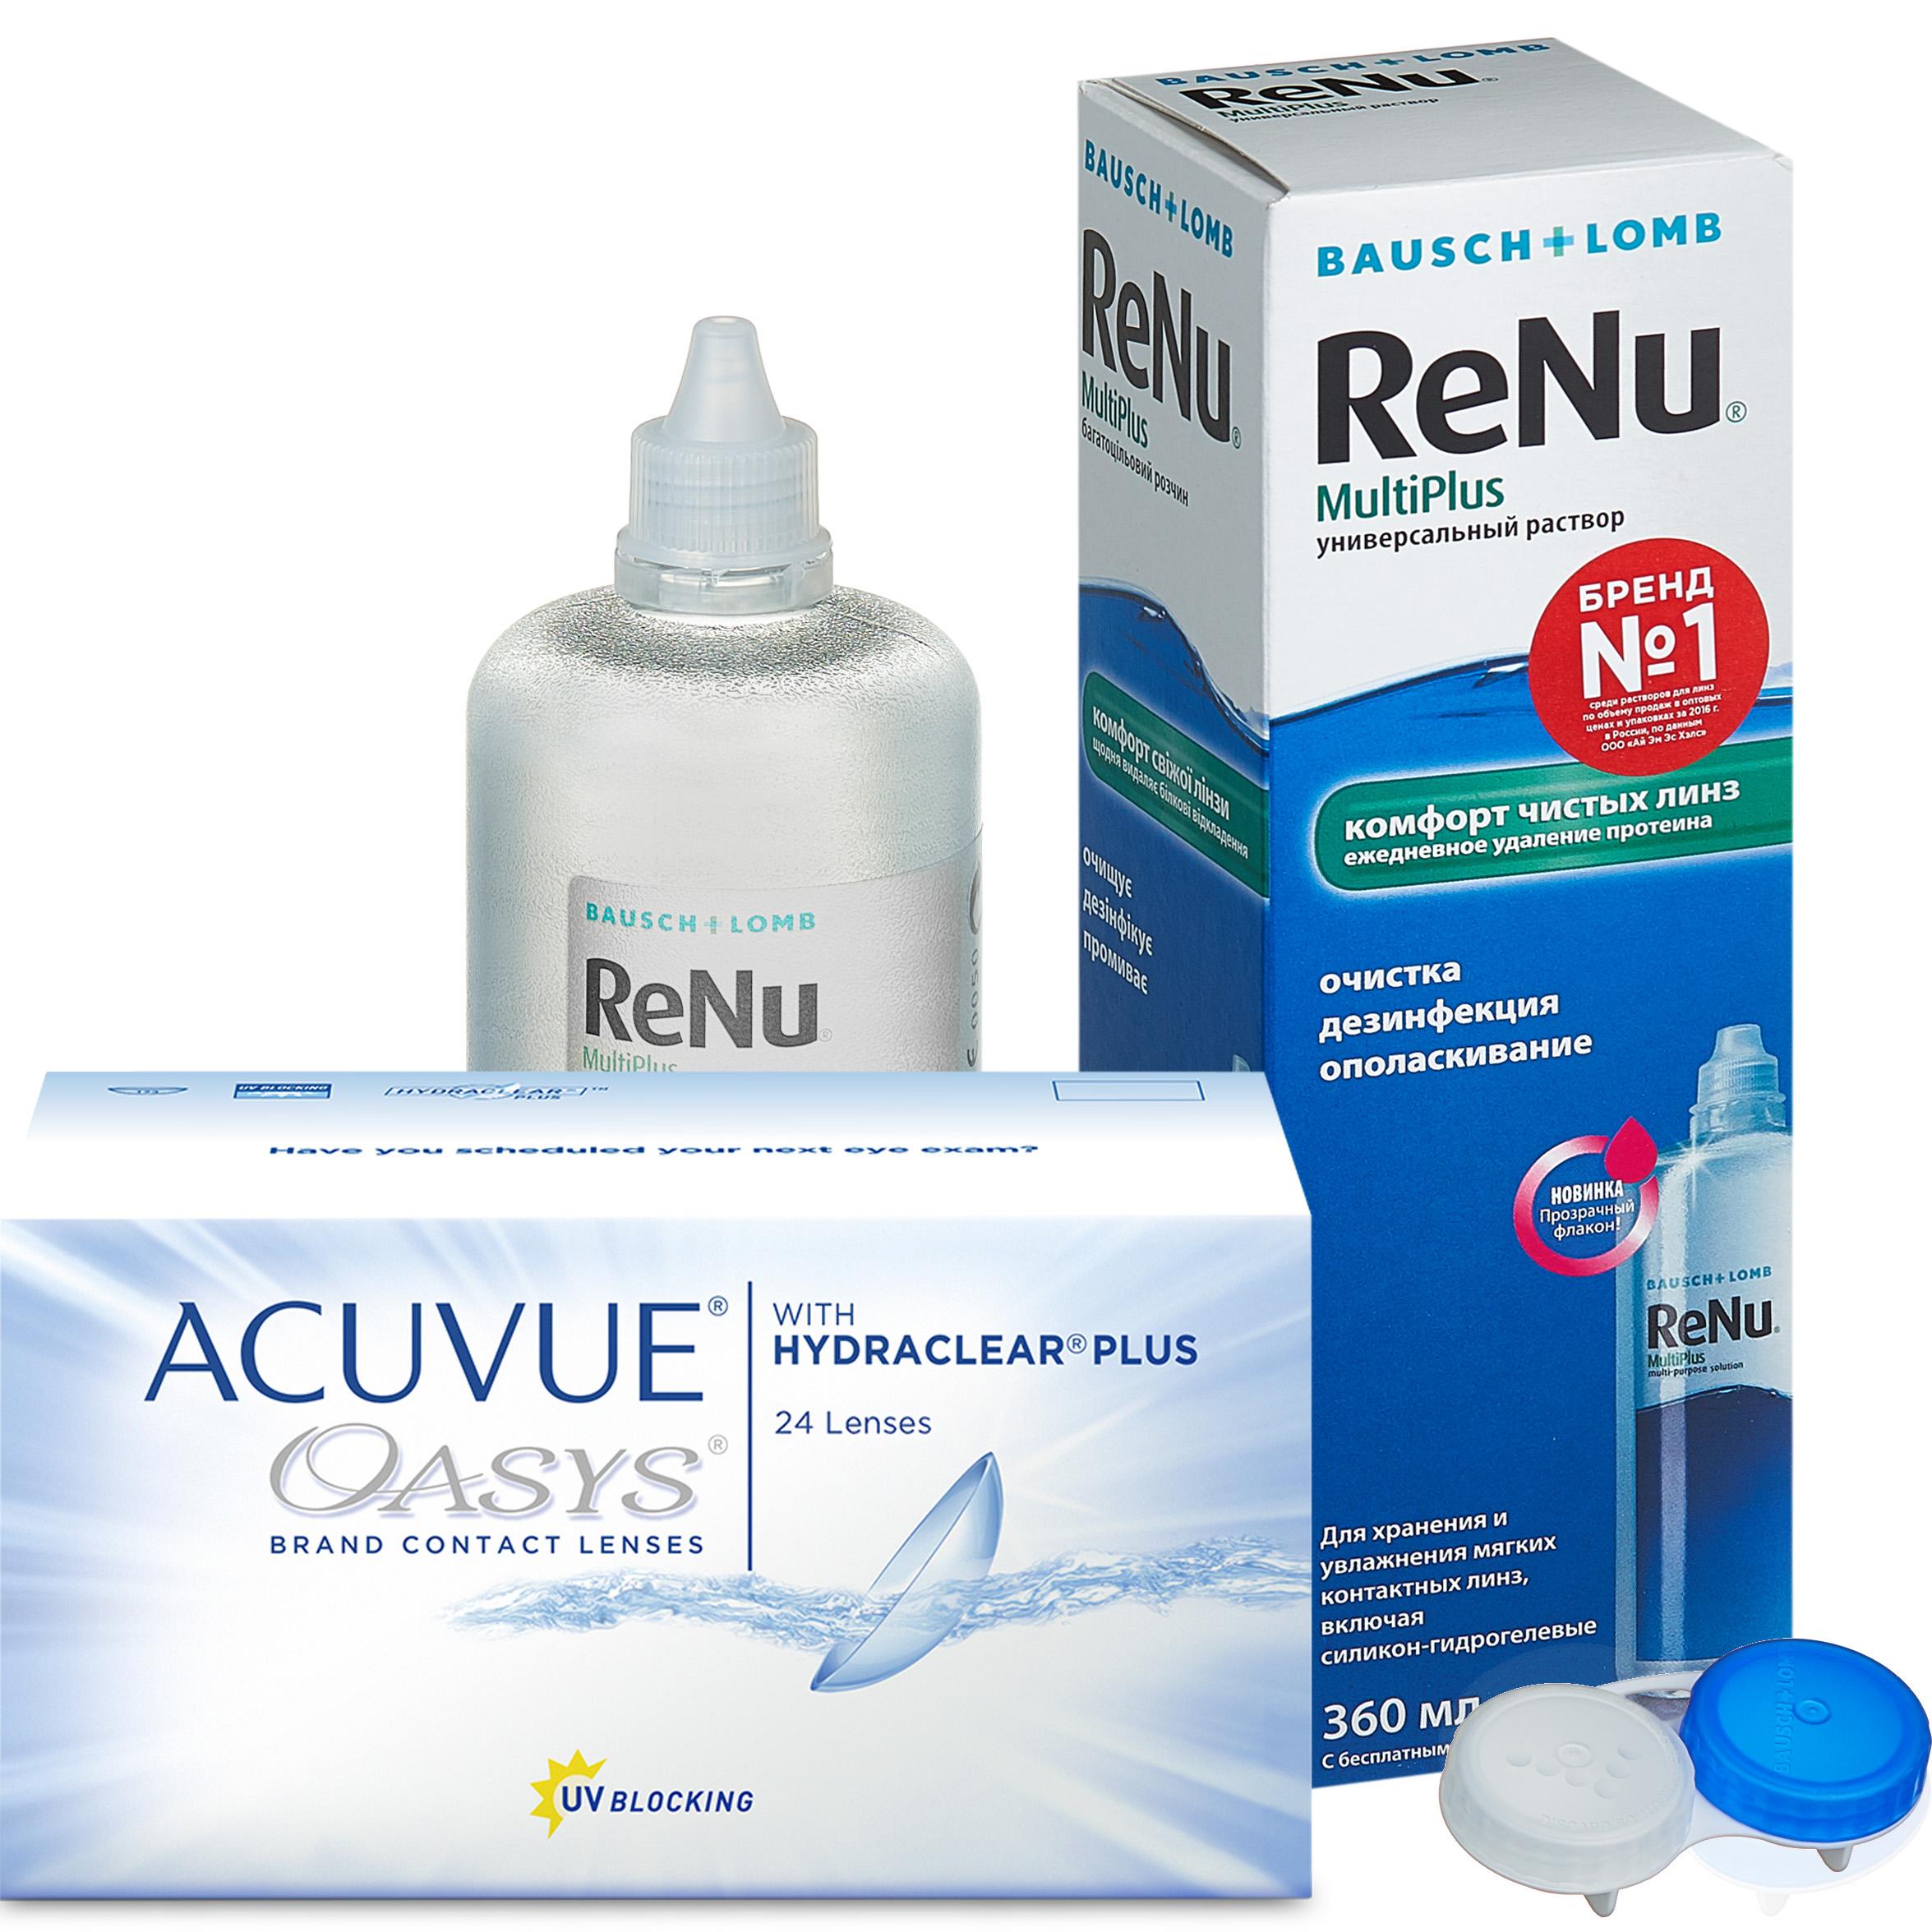 Купить Oasys with Hydraclear Plus 24 линзы + ReNu MultiPlus, Линзы Acuvue Oasys with Hydraclear Plus 24 линзы R 8.4 +4, 50 + ReNu Multi Plus 360 мл